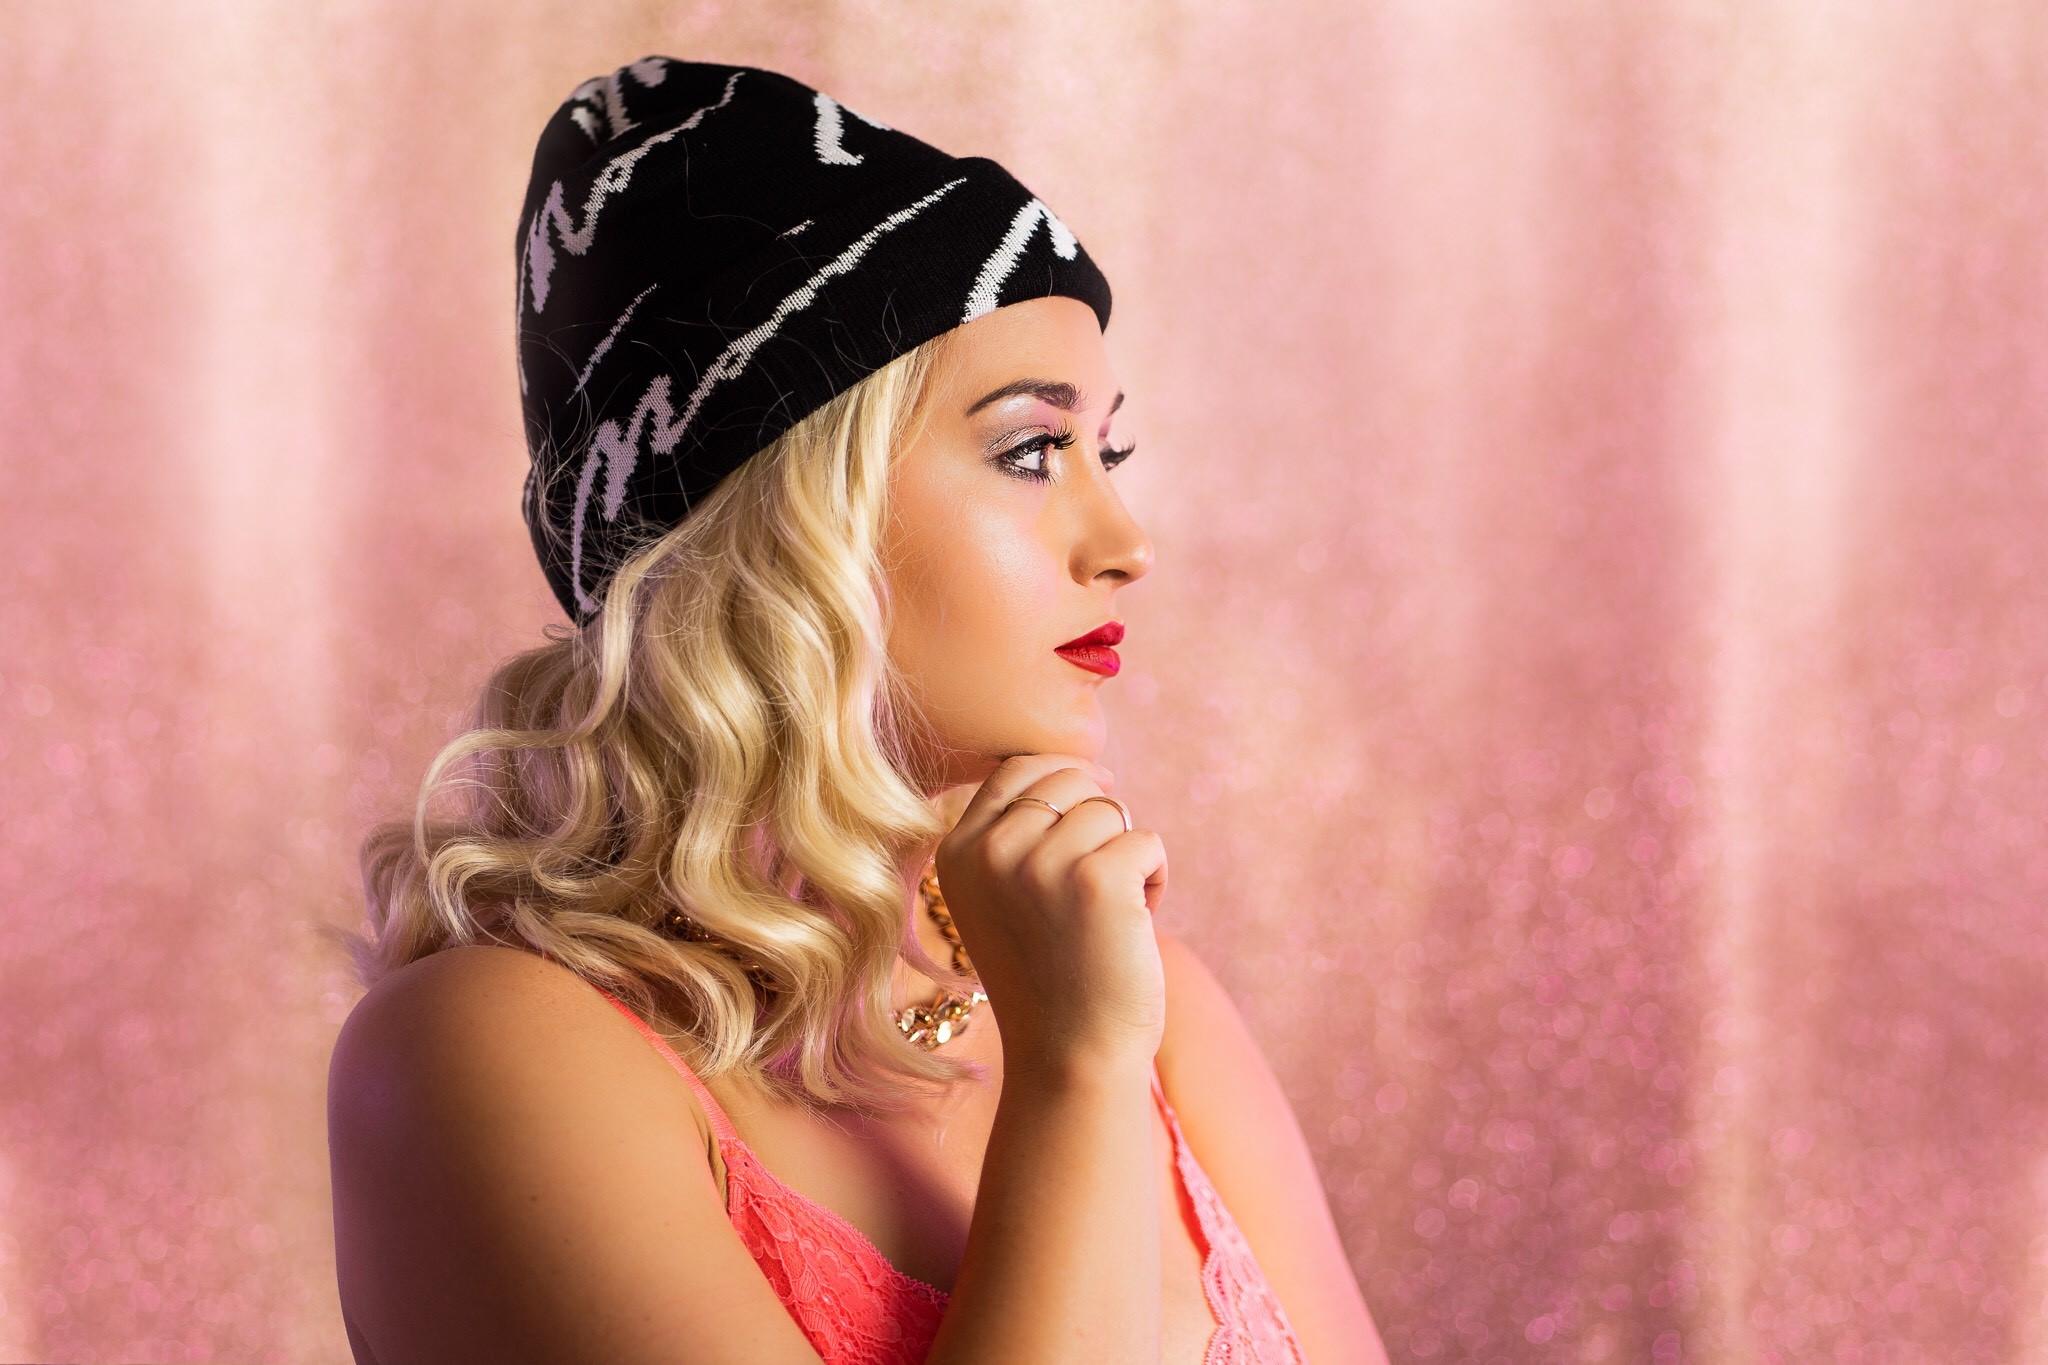 Rita Ora Tribute - Reeta Ora